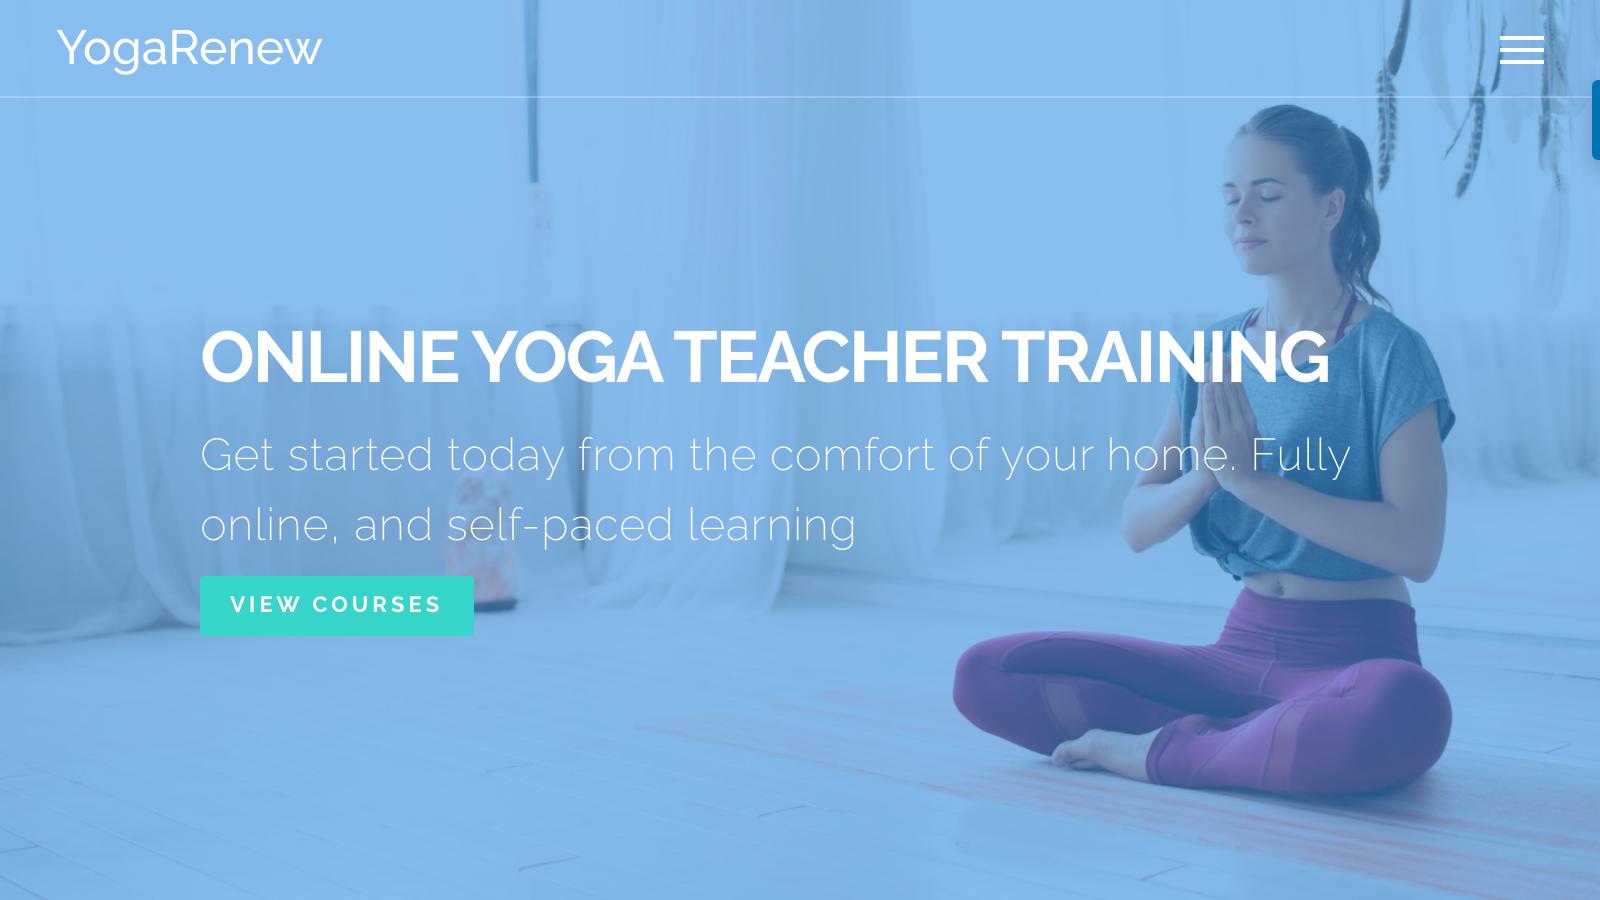 yogarenew home page screenshot